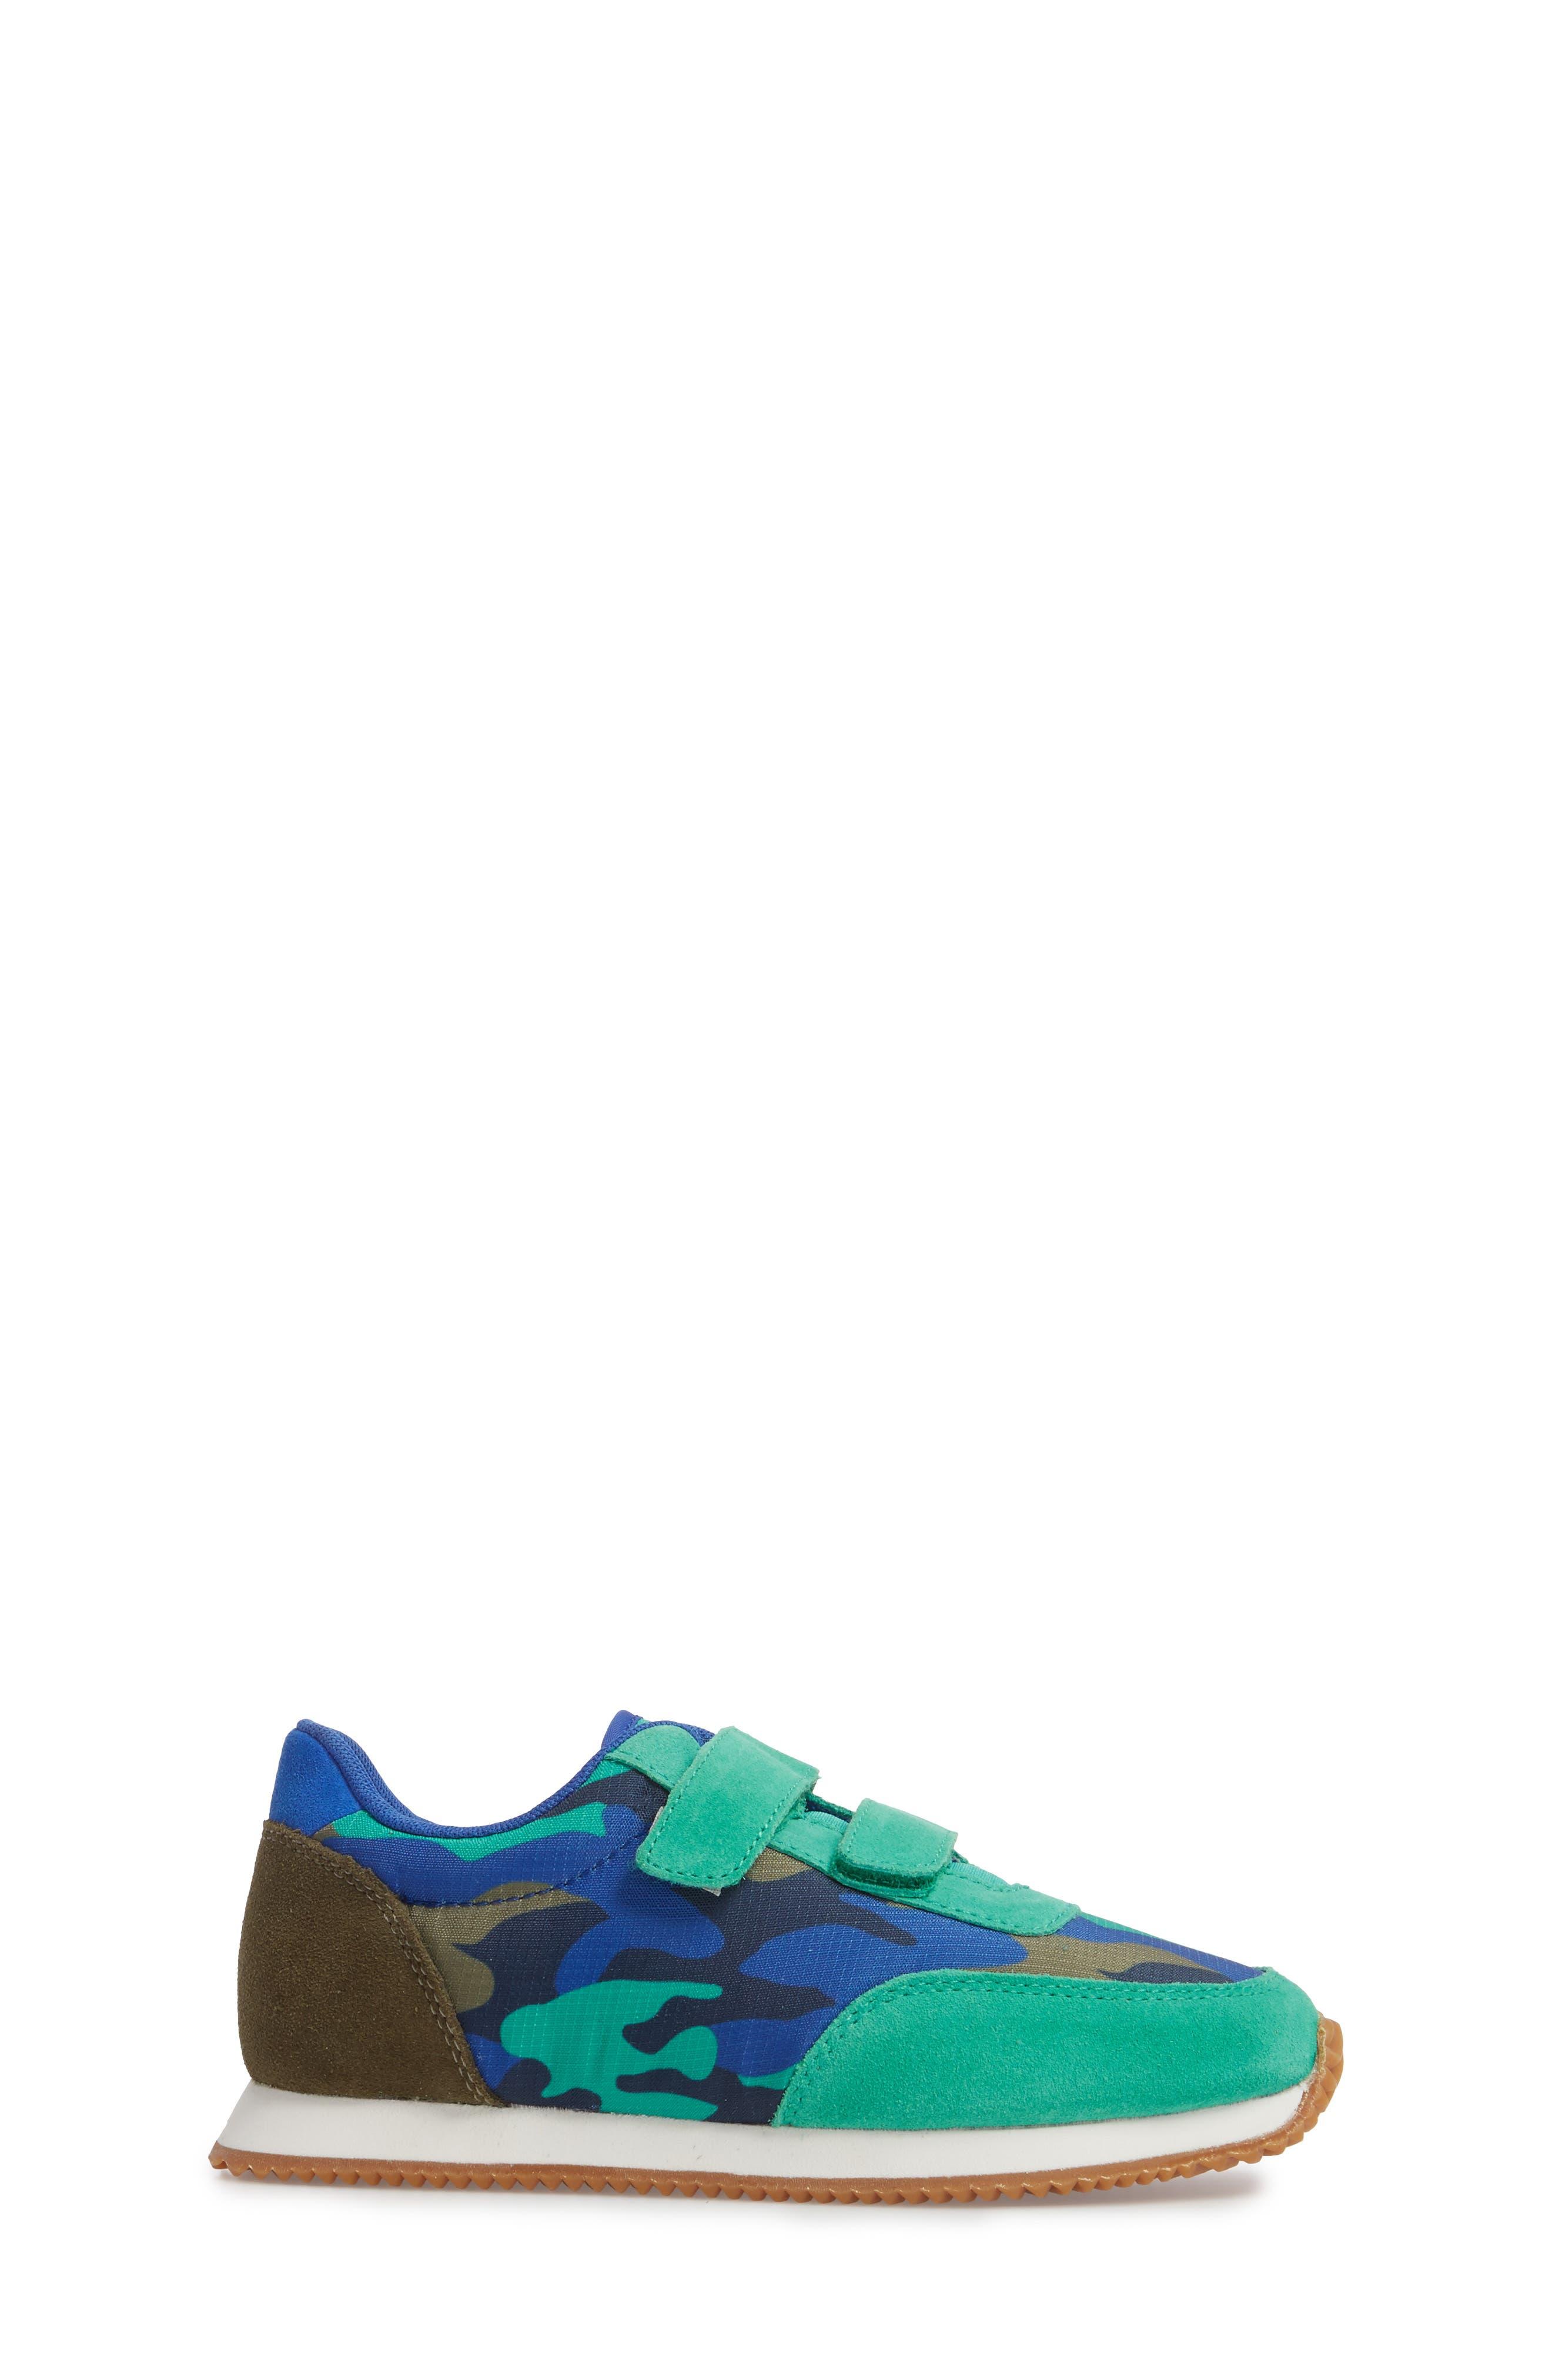 Print Sneakers,                             Alternate thumbnail 3, color,                             Astro Green